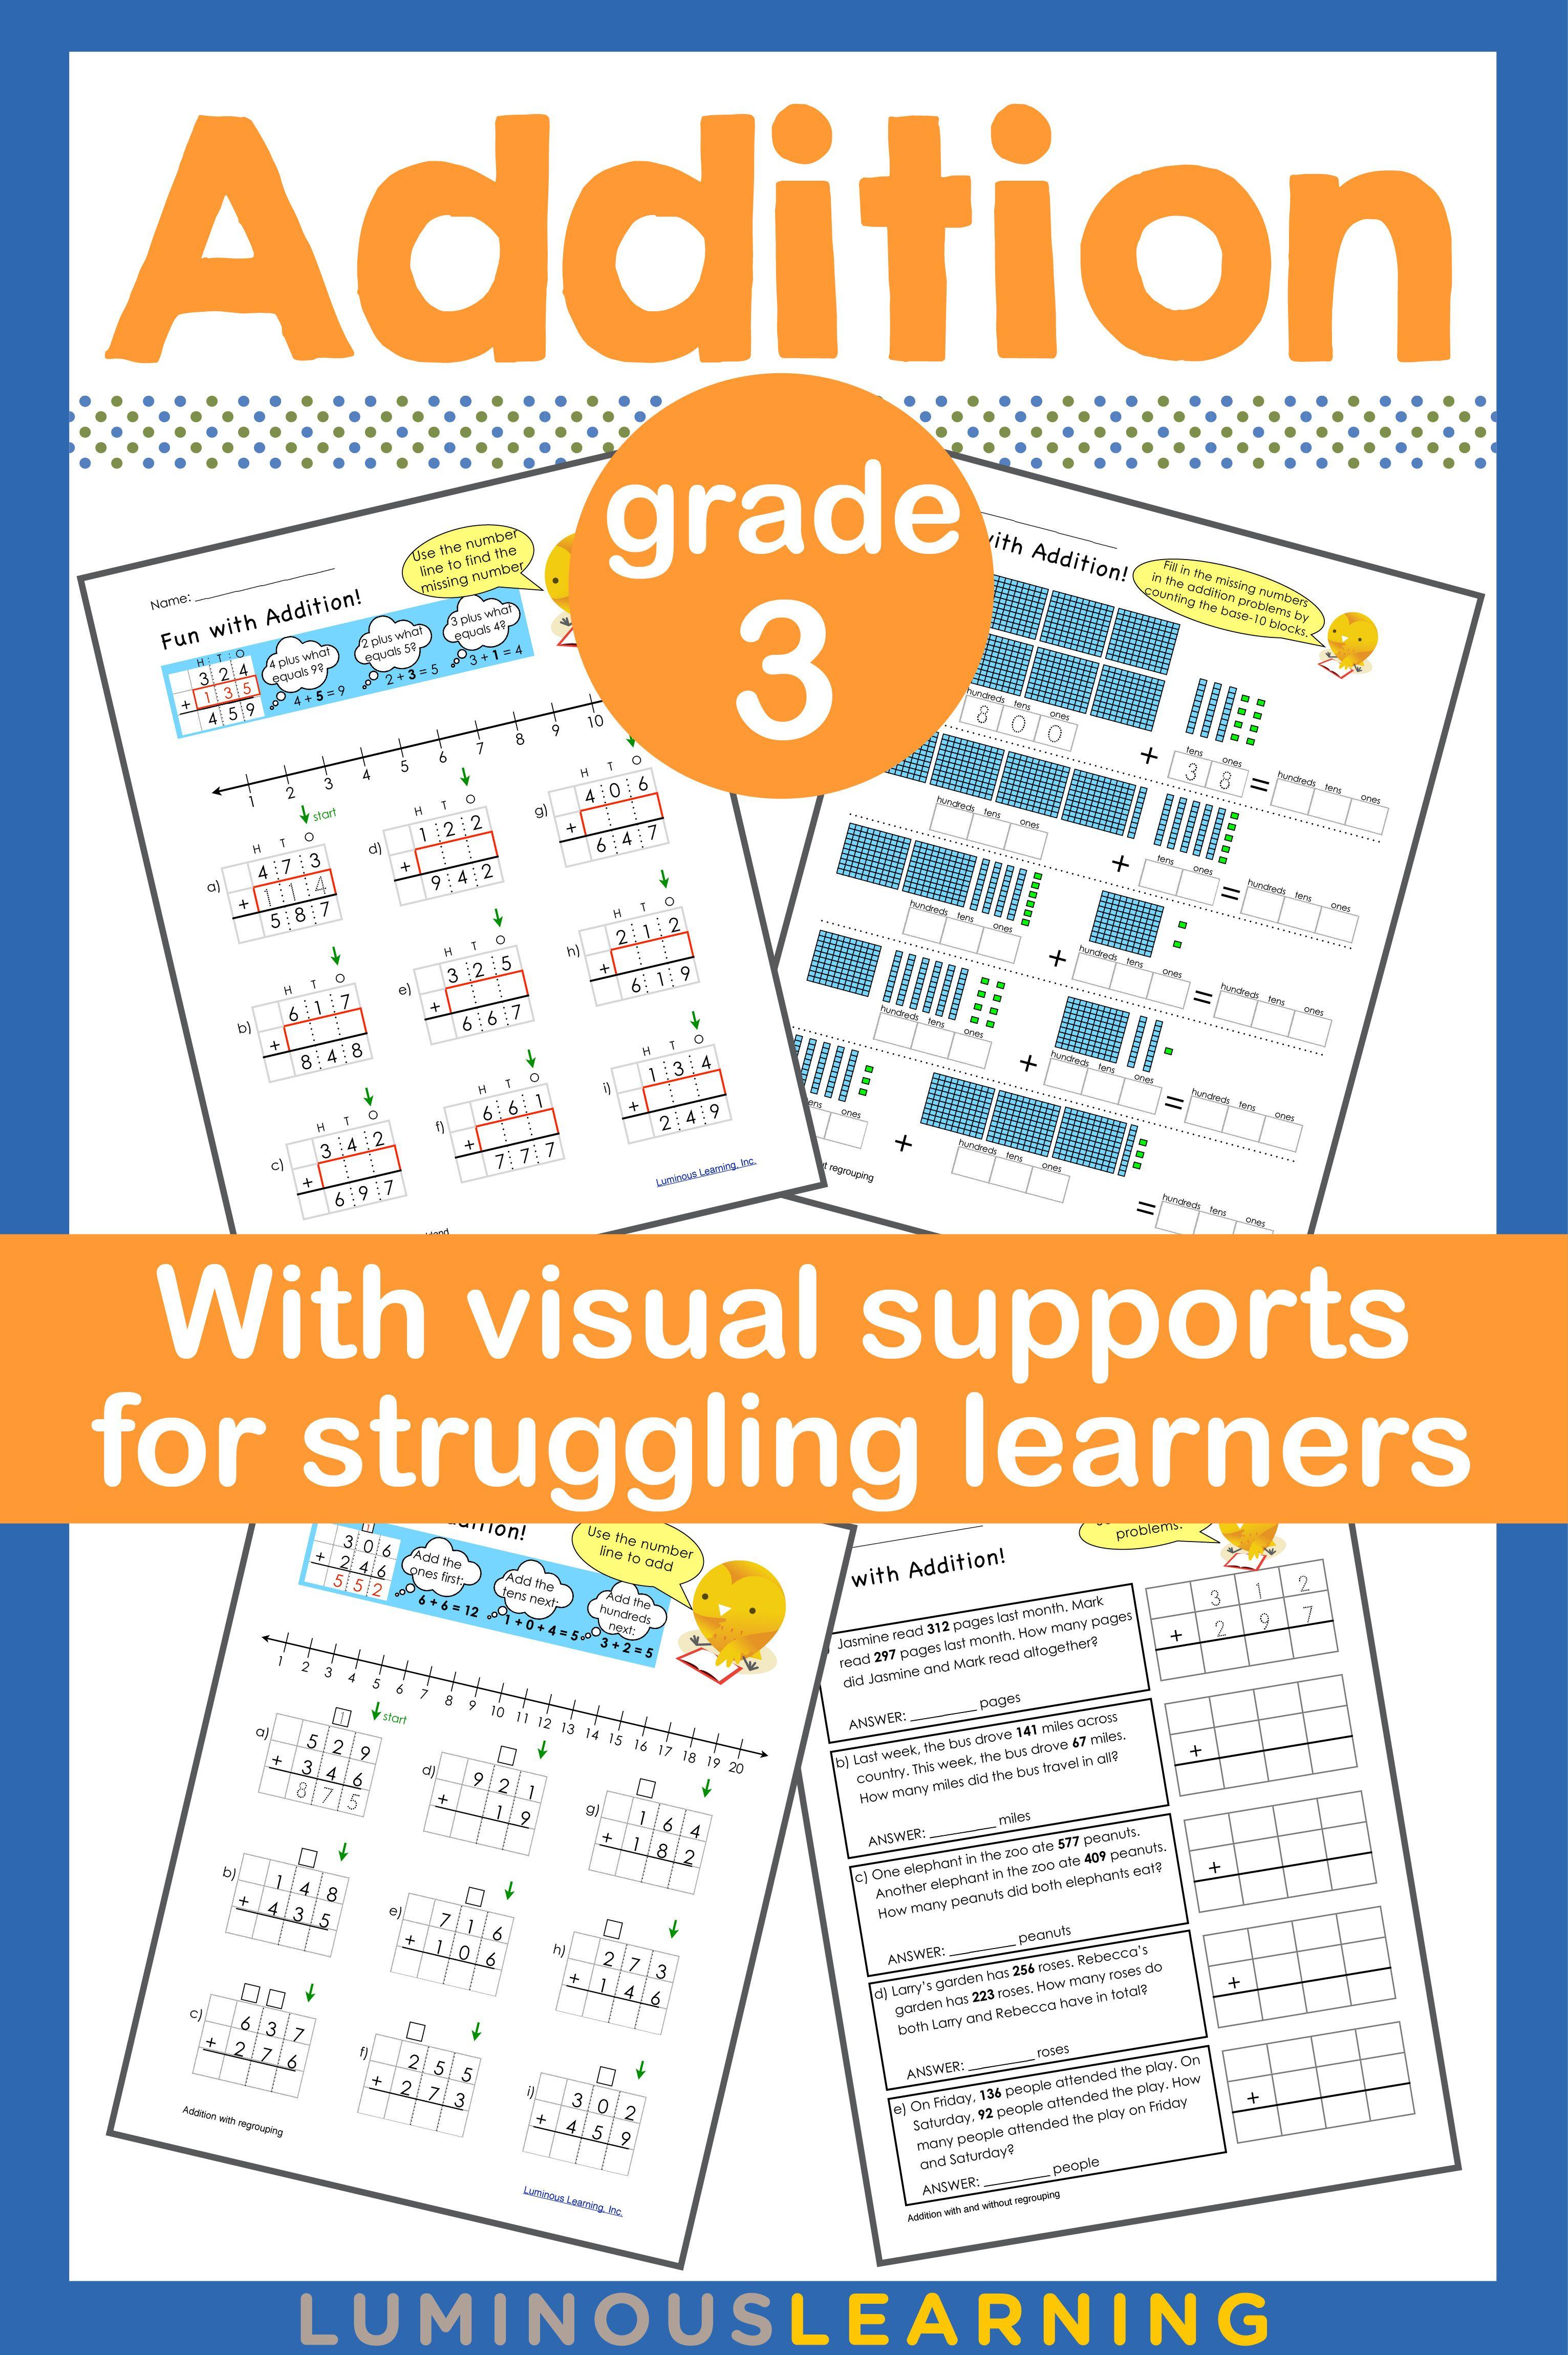 Grade 3 Addition Printable Workbook | Math skills, Maths and Students